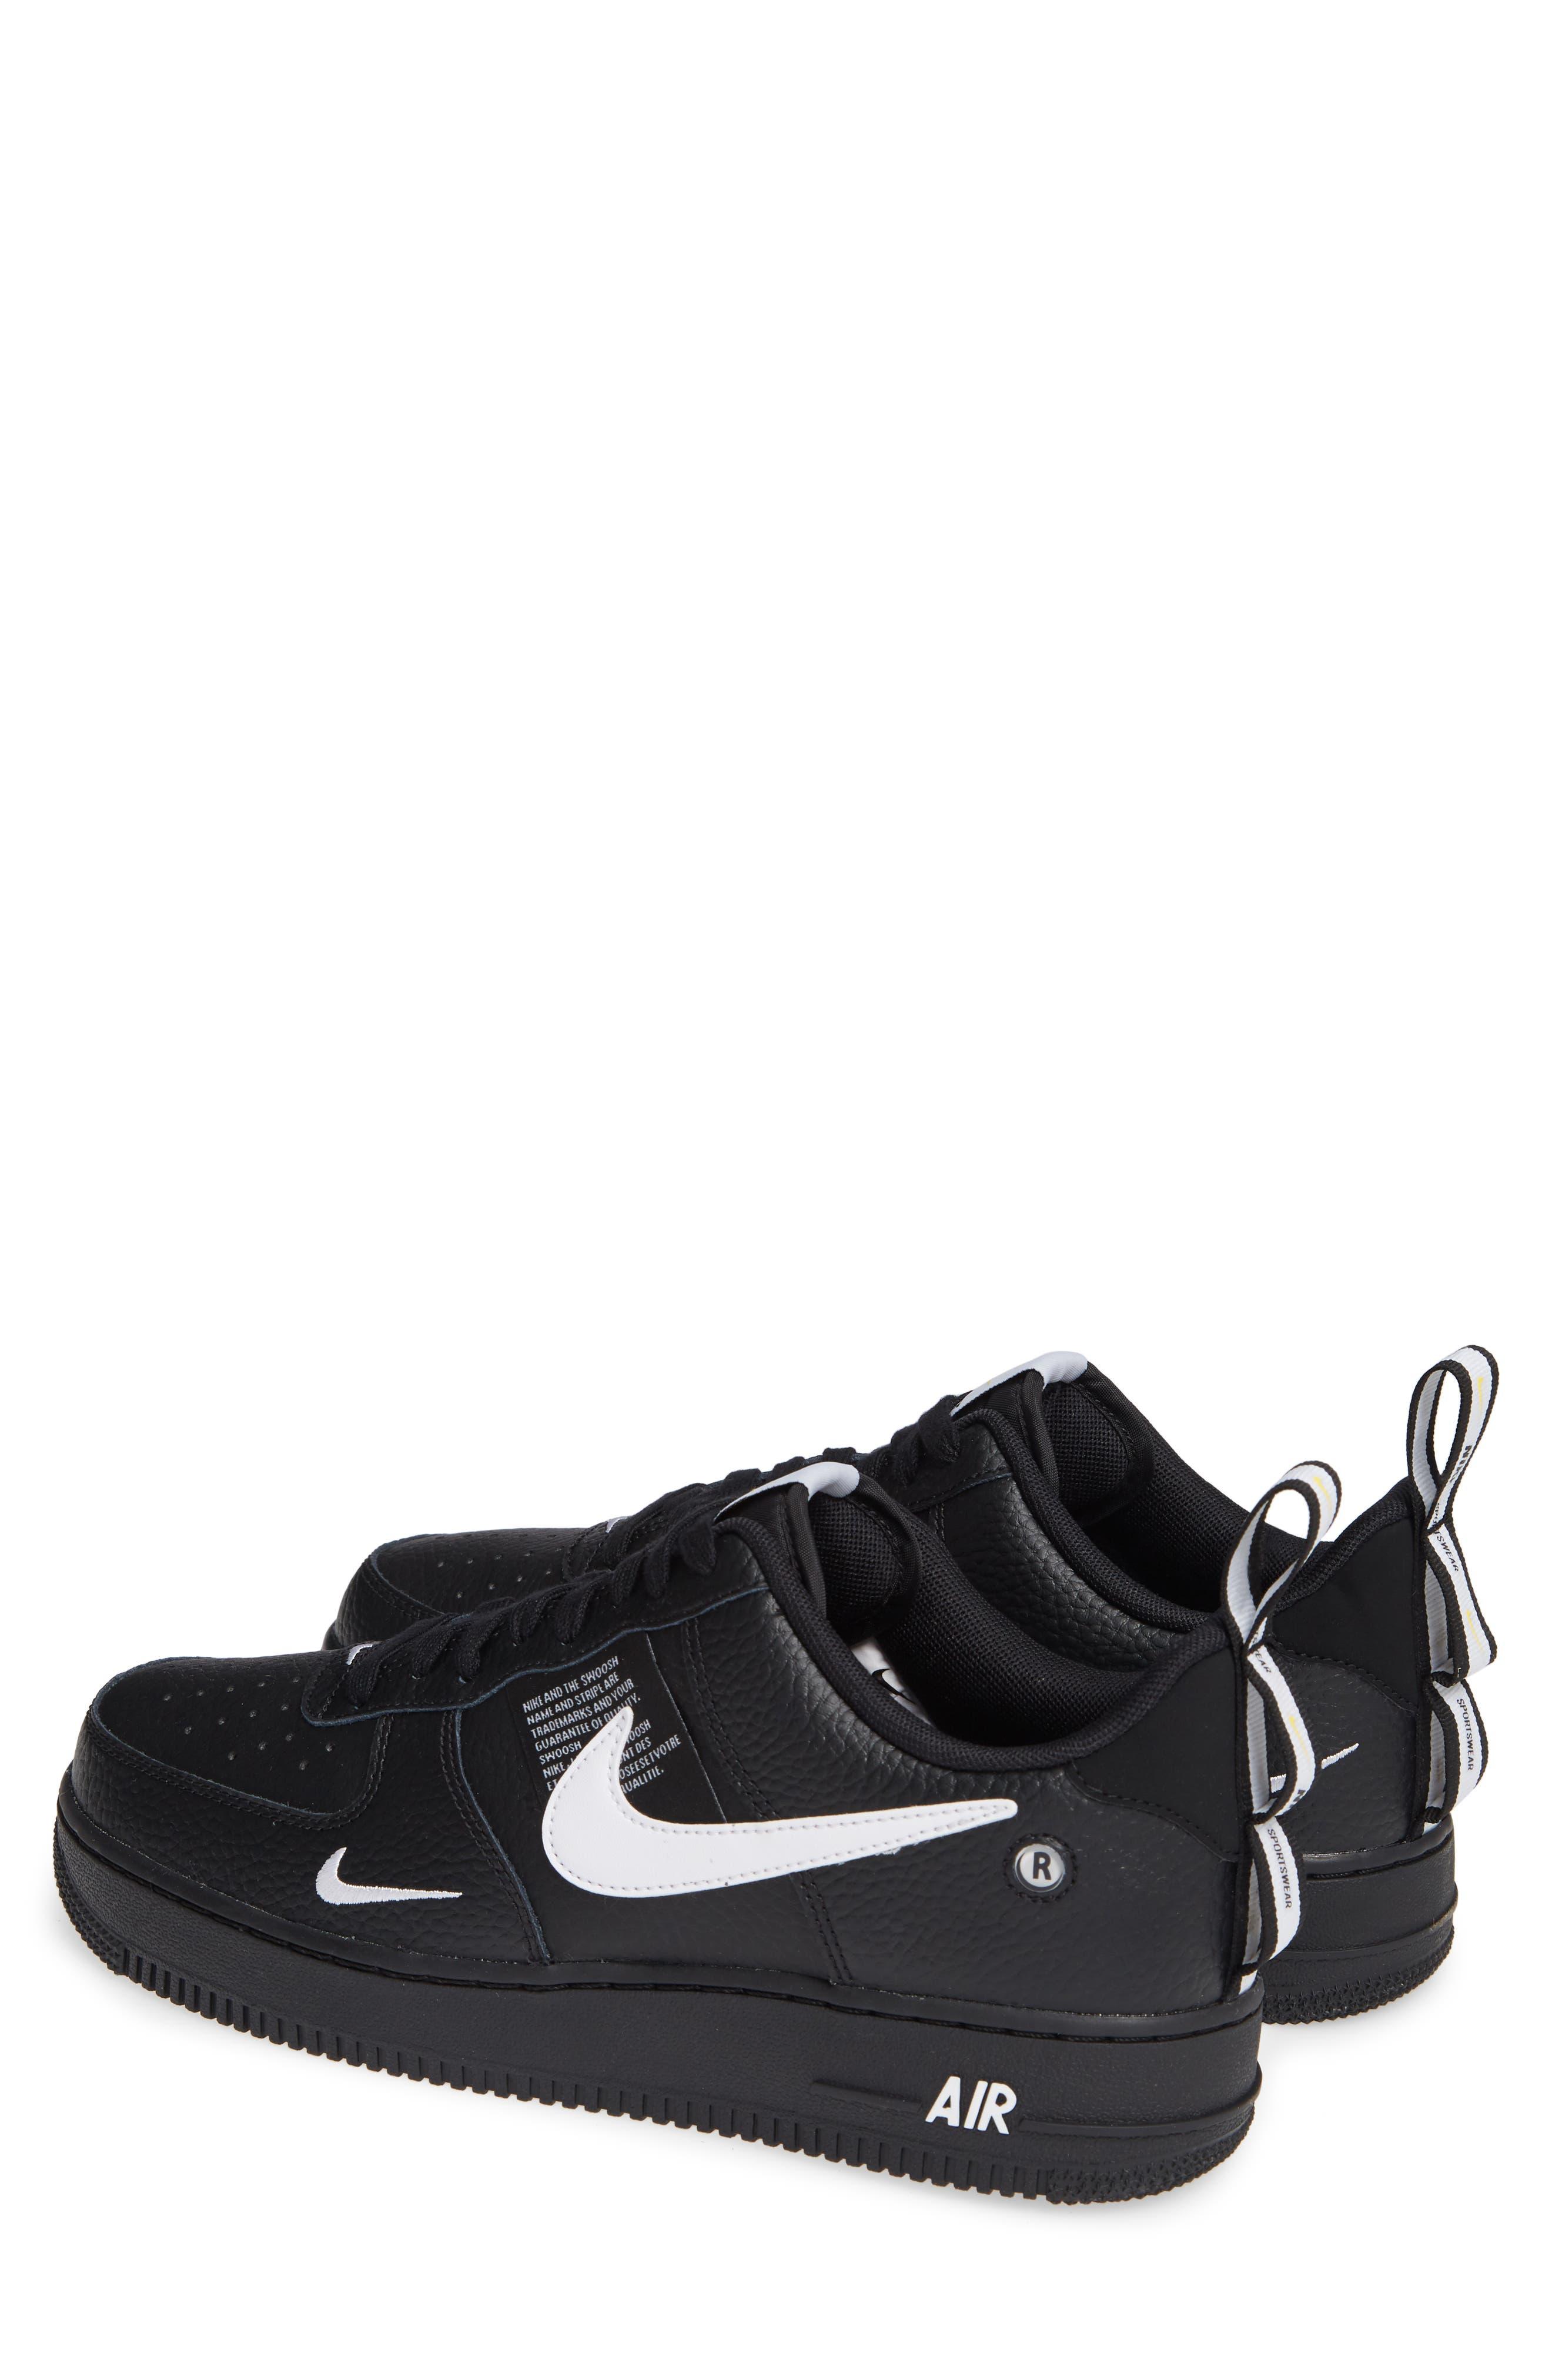 Air Force 1 '07 LV8 Utility Sneaker,                             Alternate thumbnail 3, color,                             BLACK/ WHITE/ TOUR YELLOW